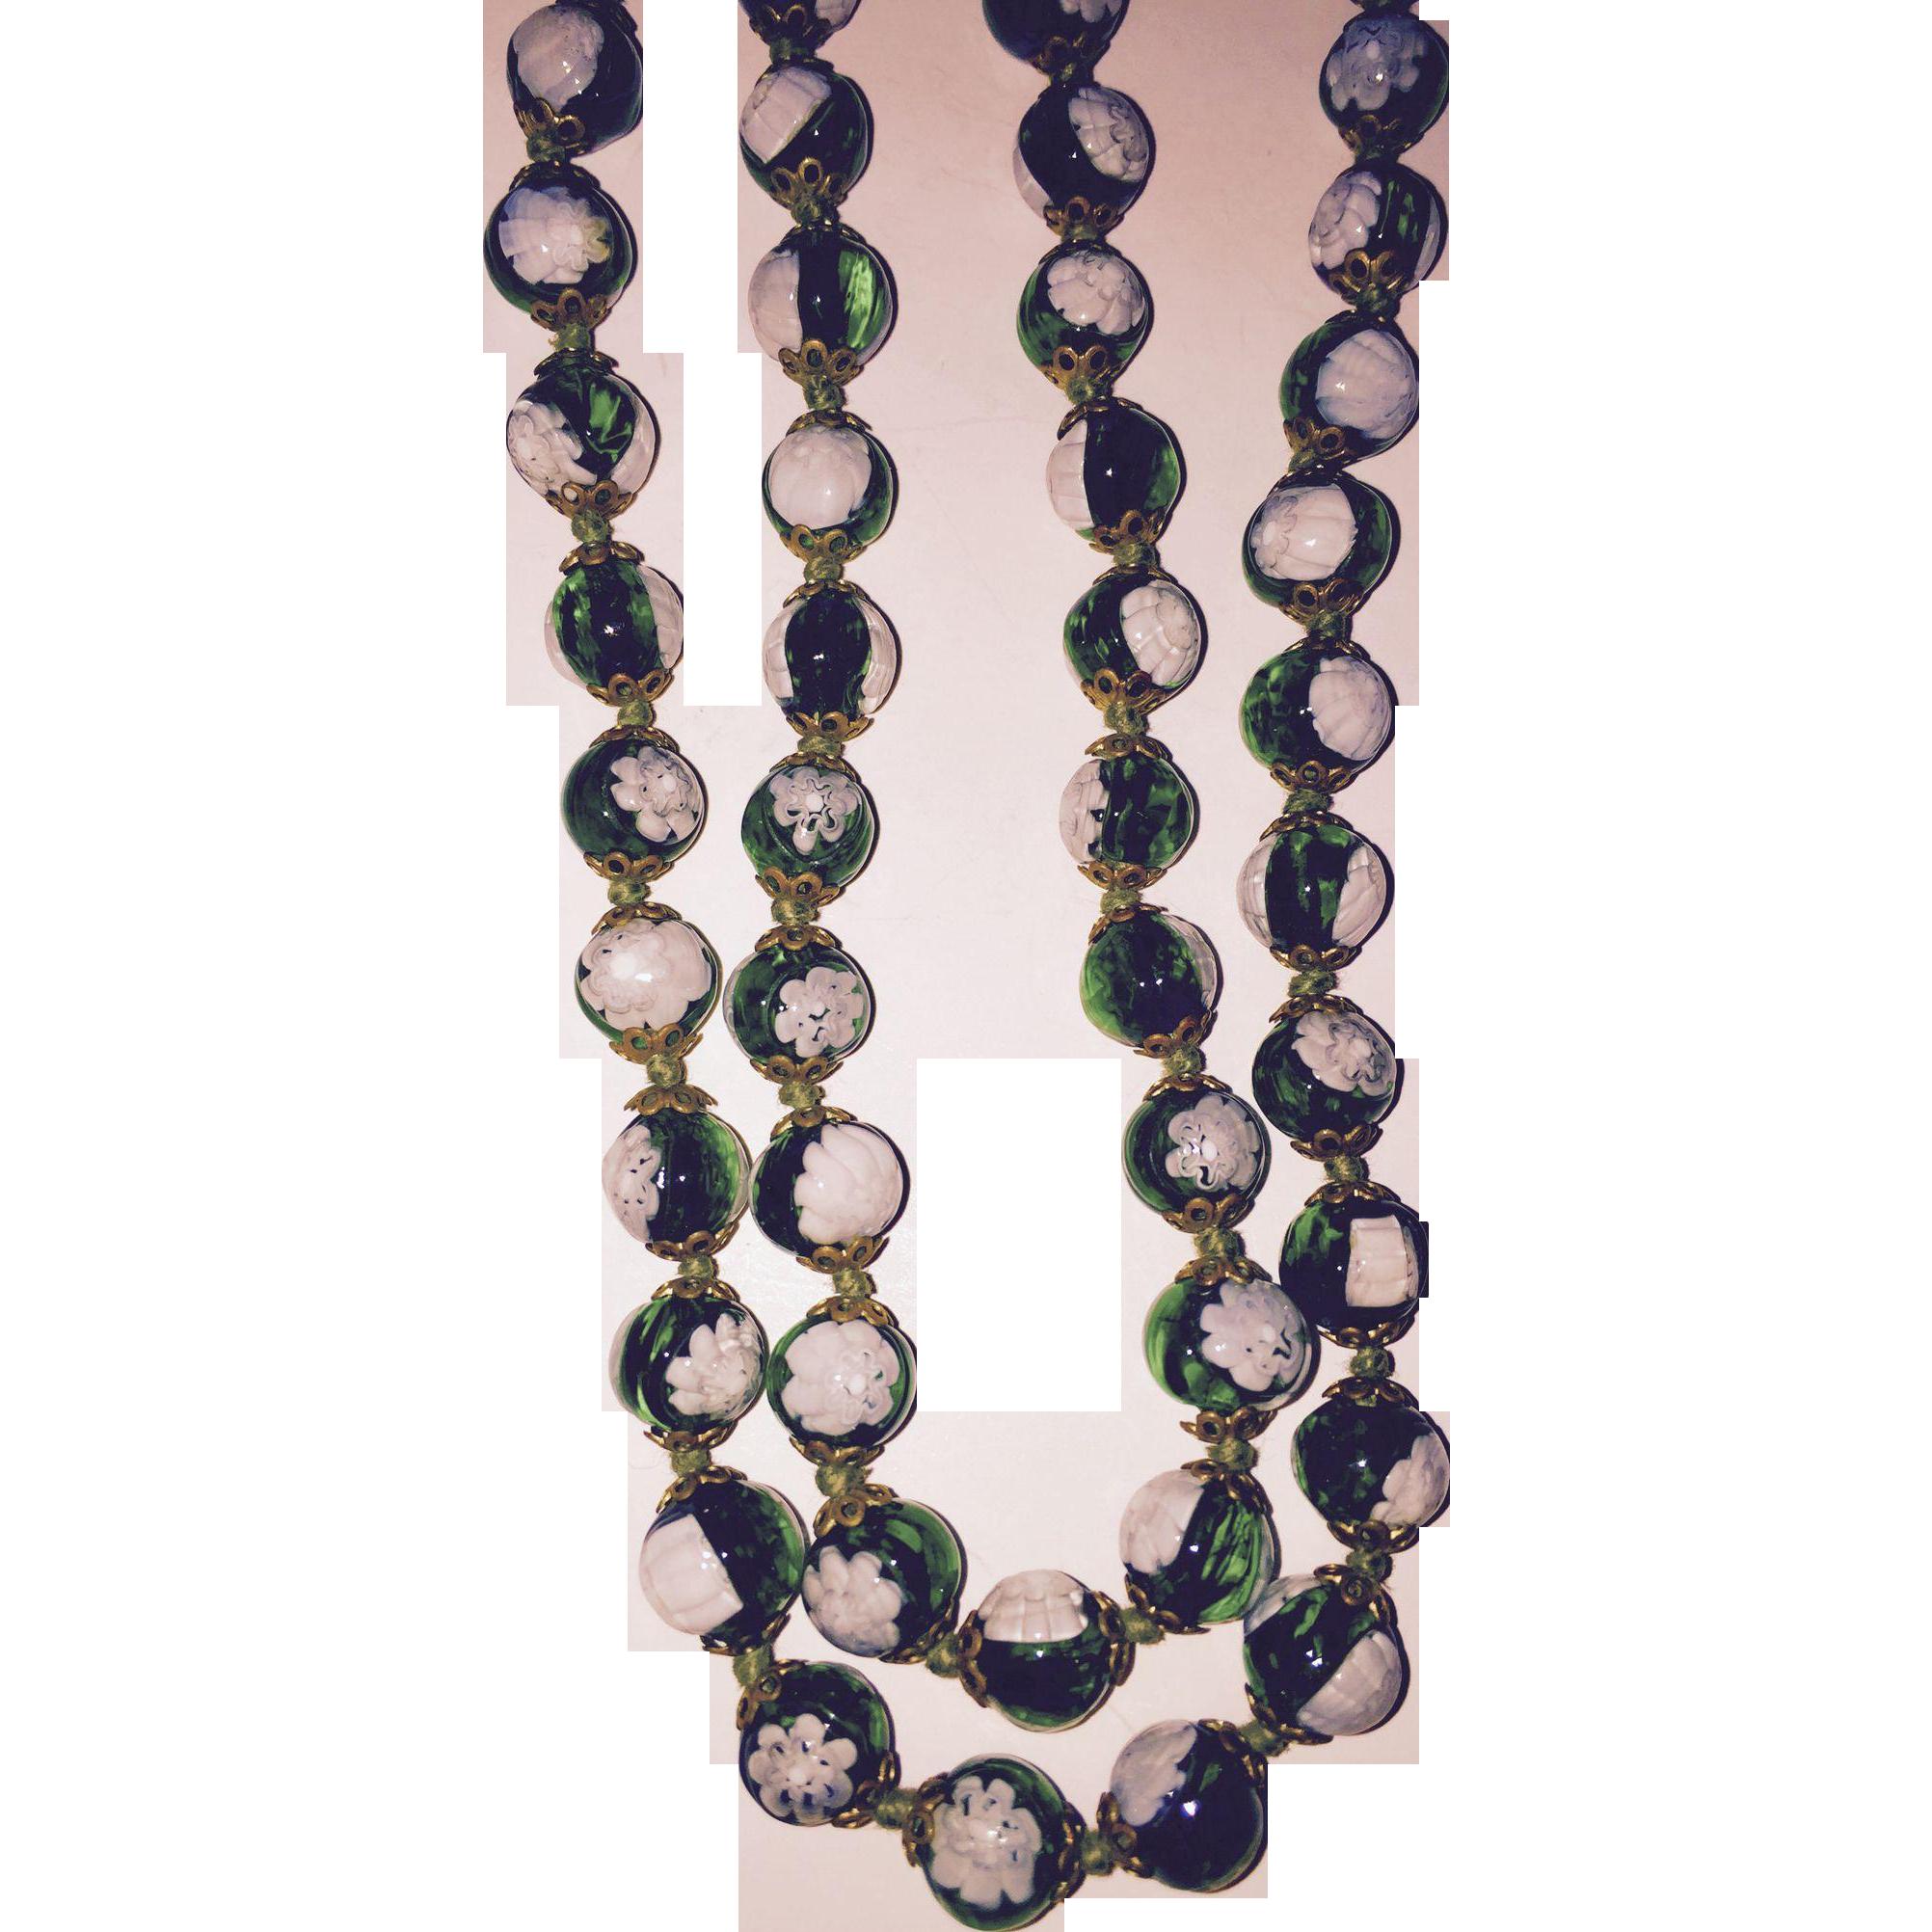 Wonderful Millefiore Green White Glass Beads